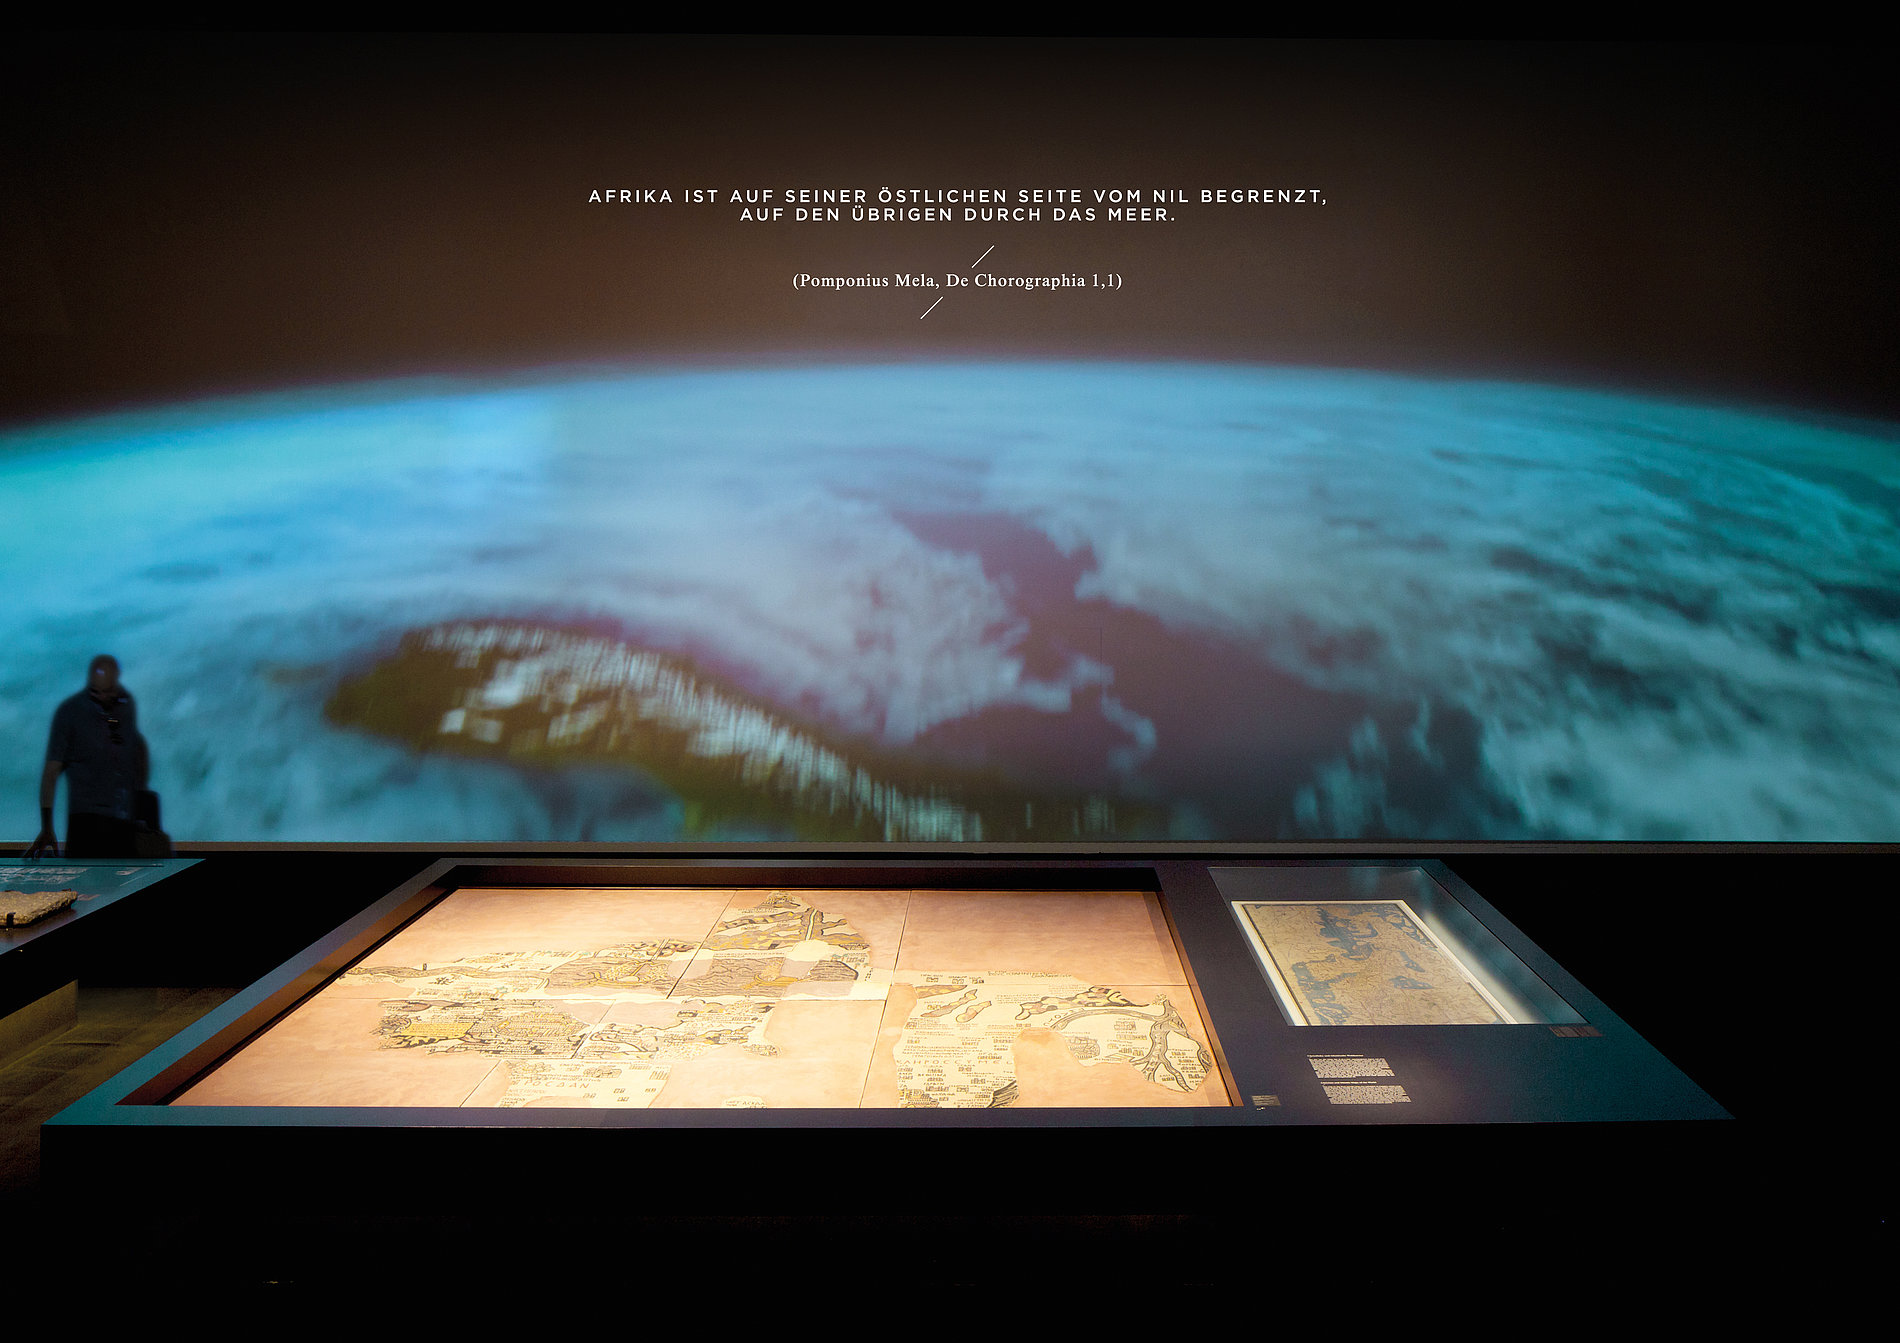 Jenseits des Horizonts Beyond the Horizon | Red Dot Design Award